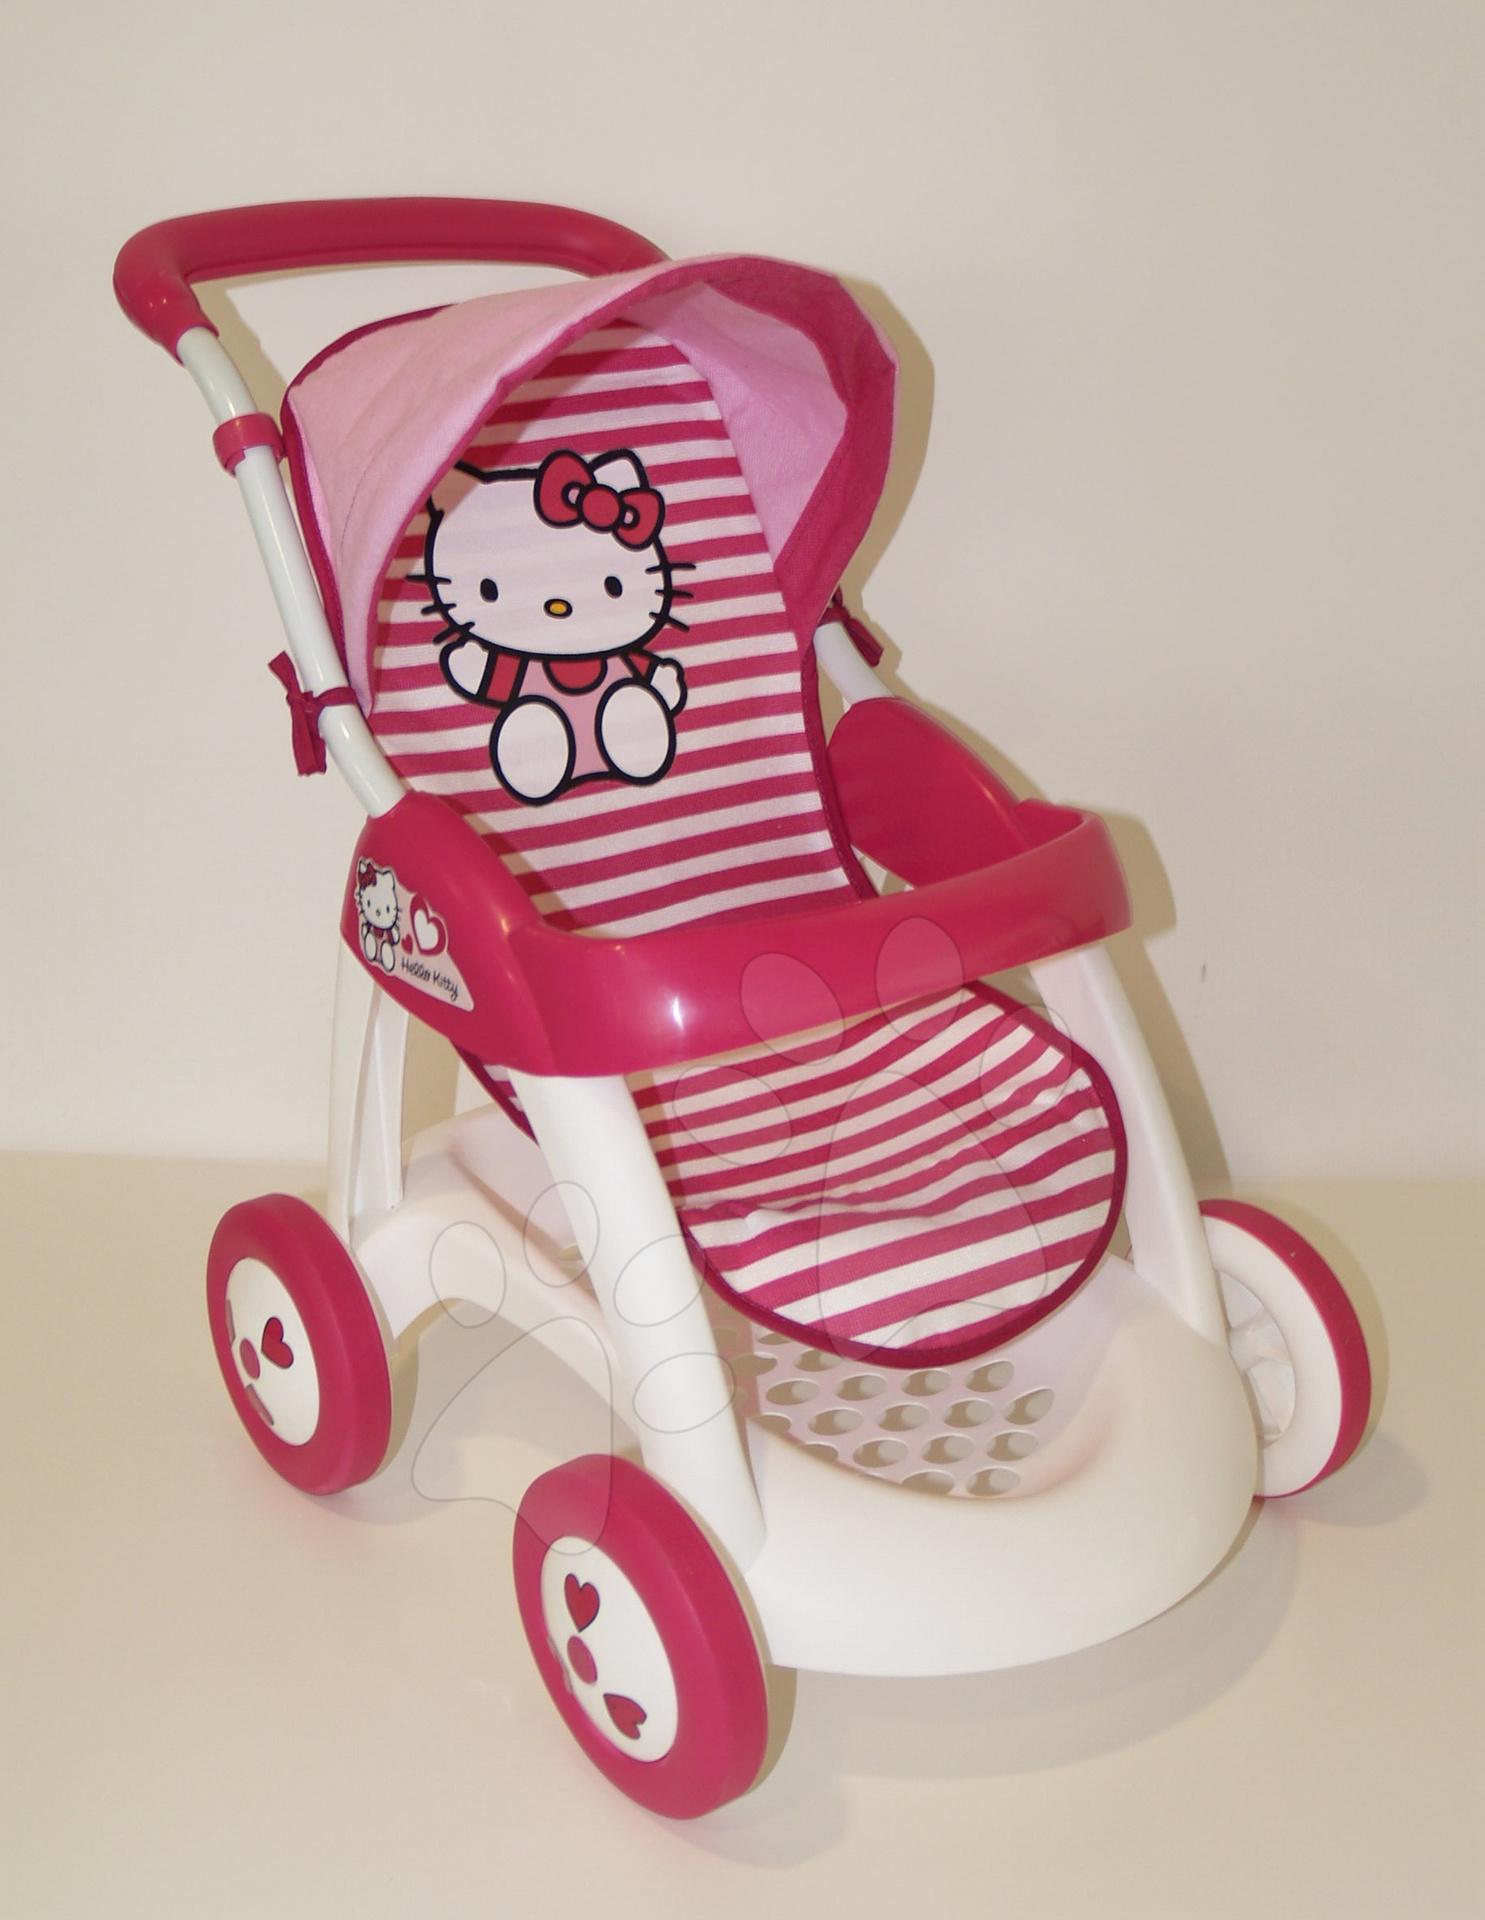 Cărucior sport Hello Kitty Smoby 60*36*70 cm de la 18 luni